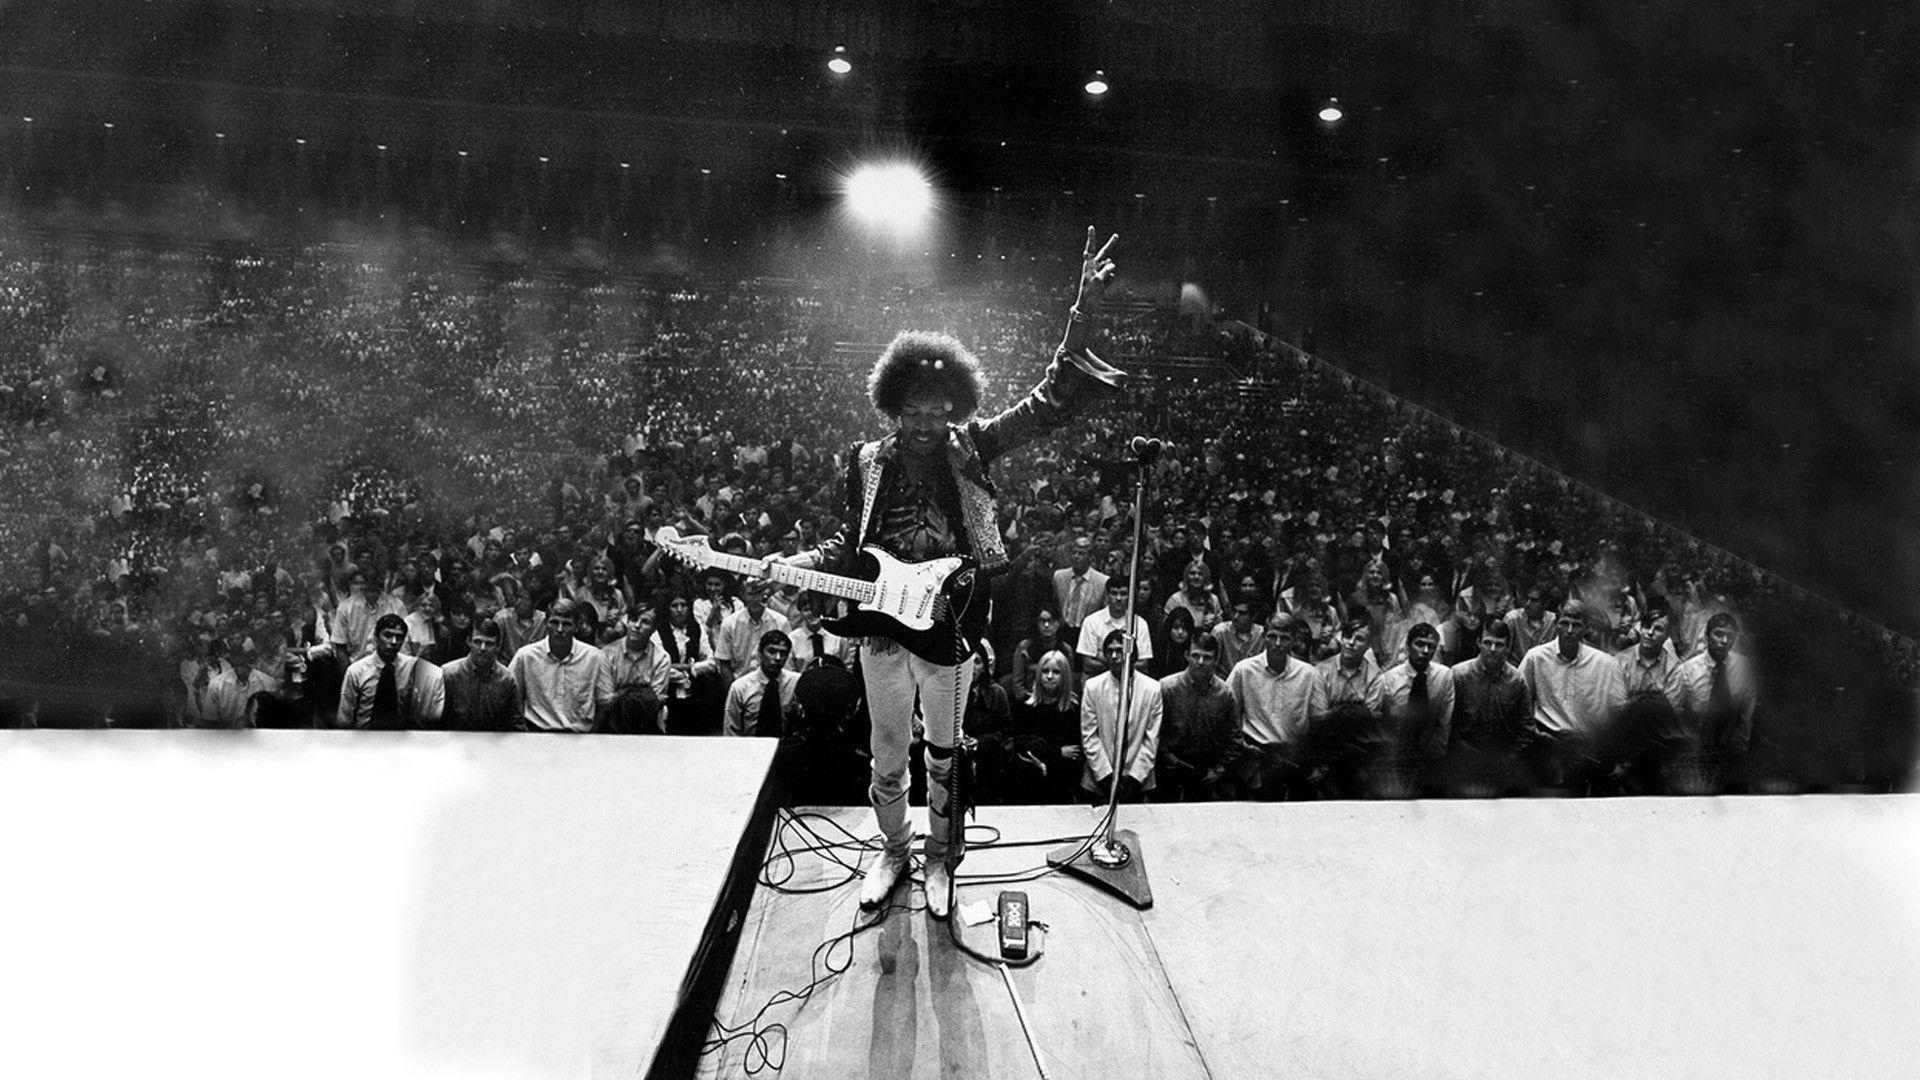 Jimi Hendrix Wallpapers - Top Free Jimi Hendrix ...